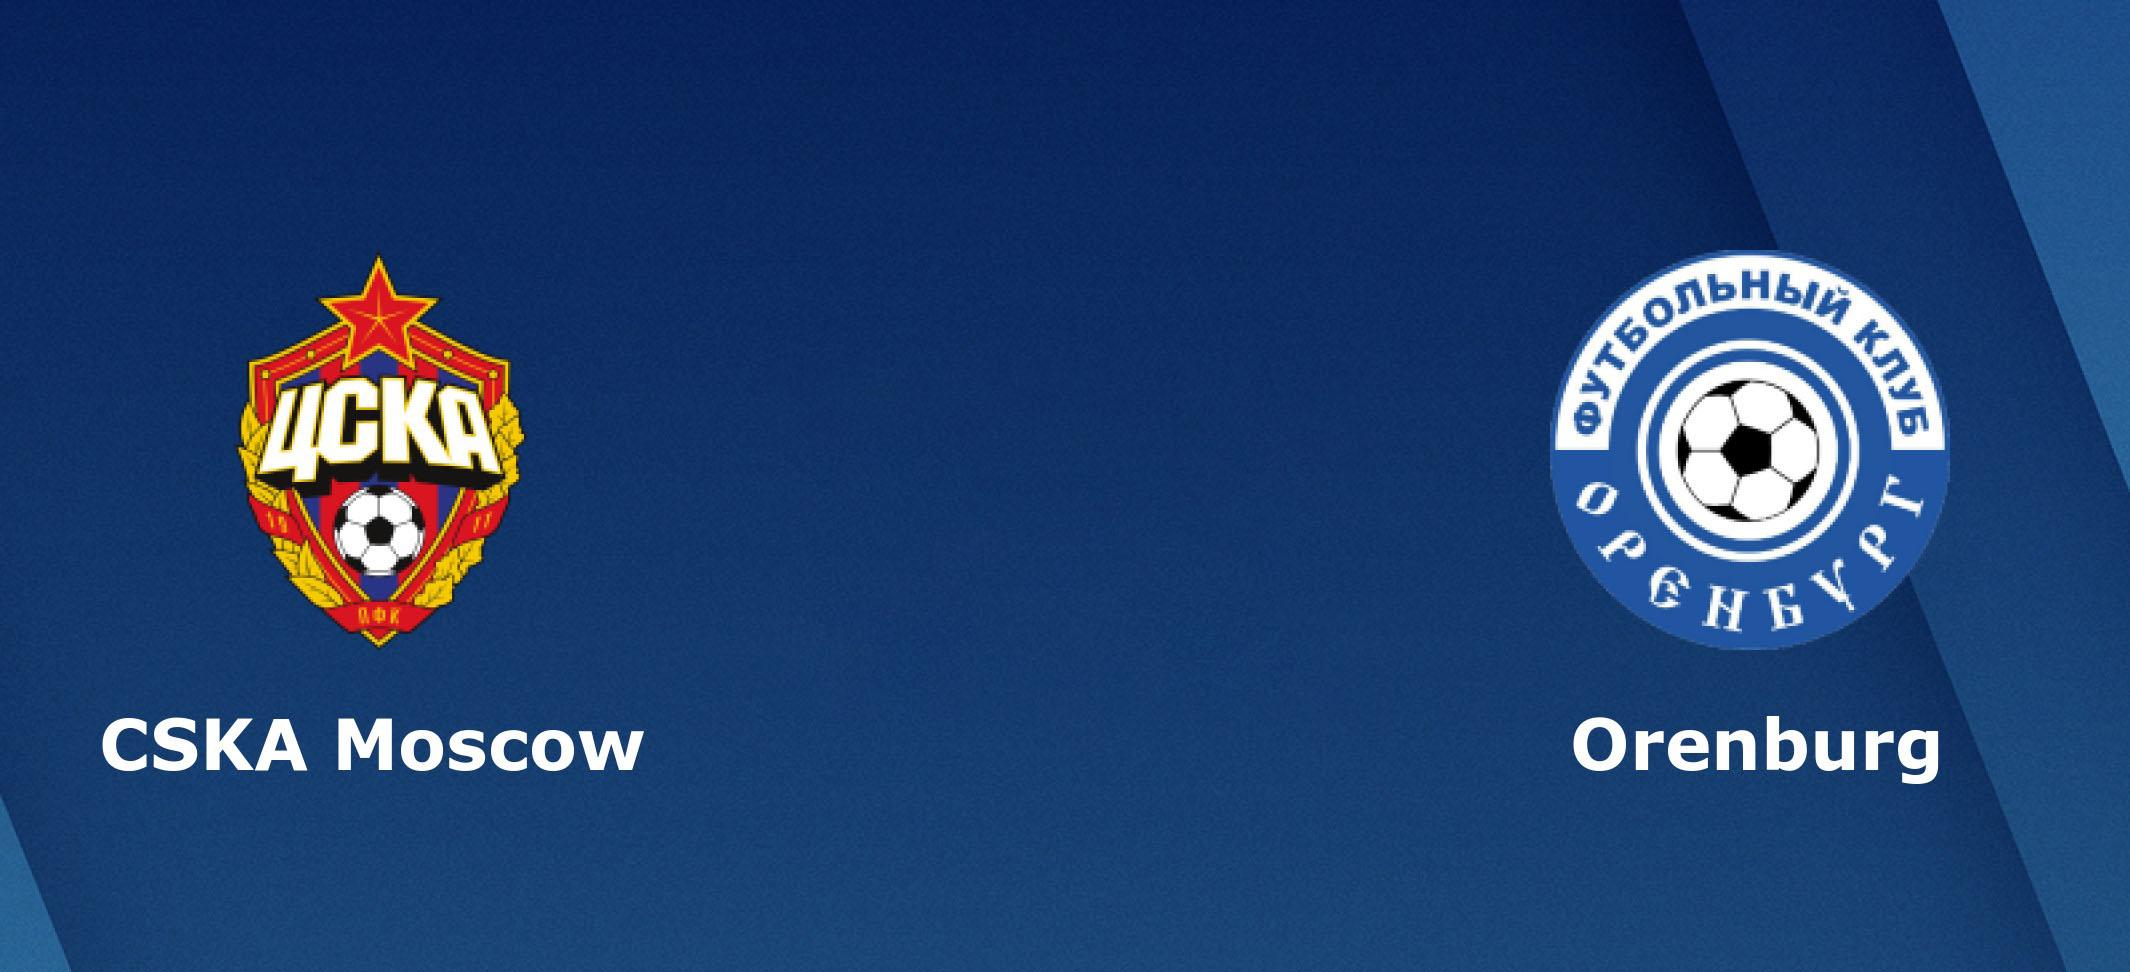 tip-bong-da-tran-cska-moscow-vs-orenburg-–-23h00-20-07-2019-–-giai-vo-dich-quoc-gia-nga-fa-1